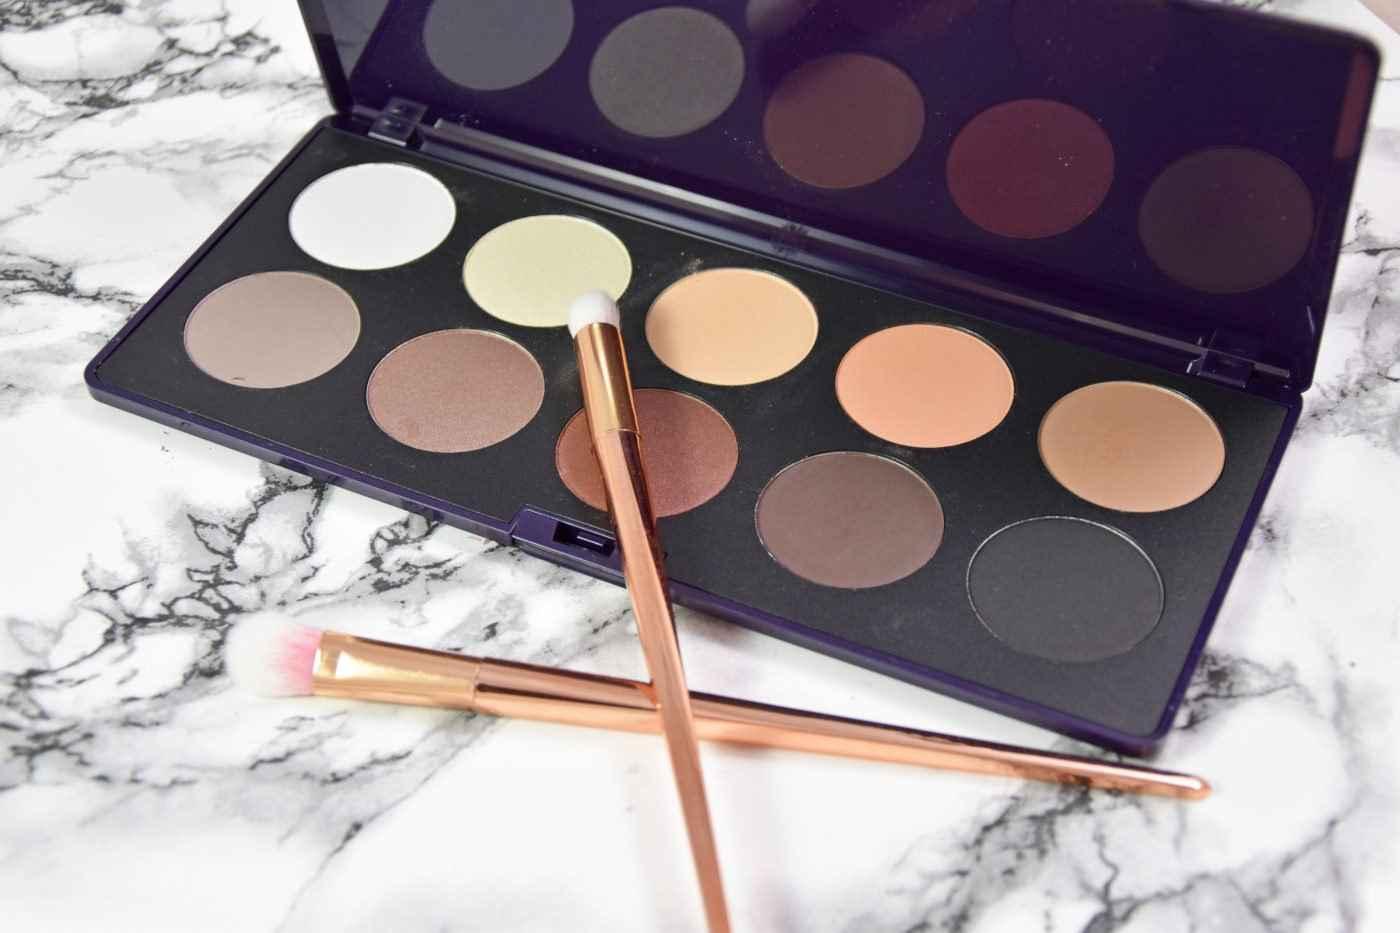 Neve Cosmetics Elegantissimi Eyeshadow - Lidschatten Palette